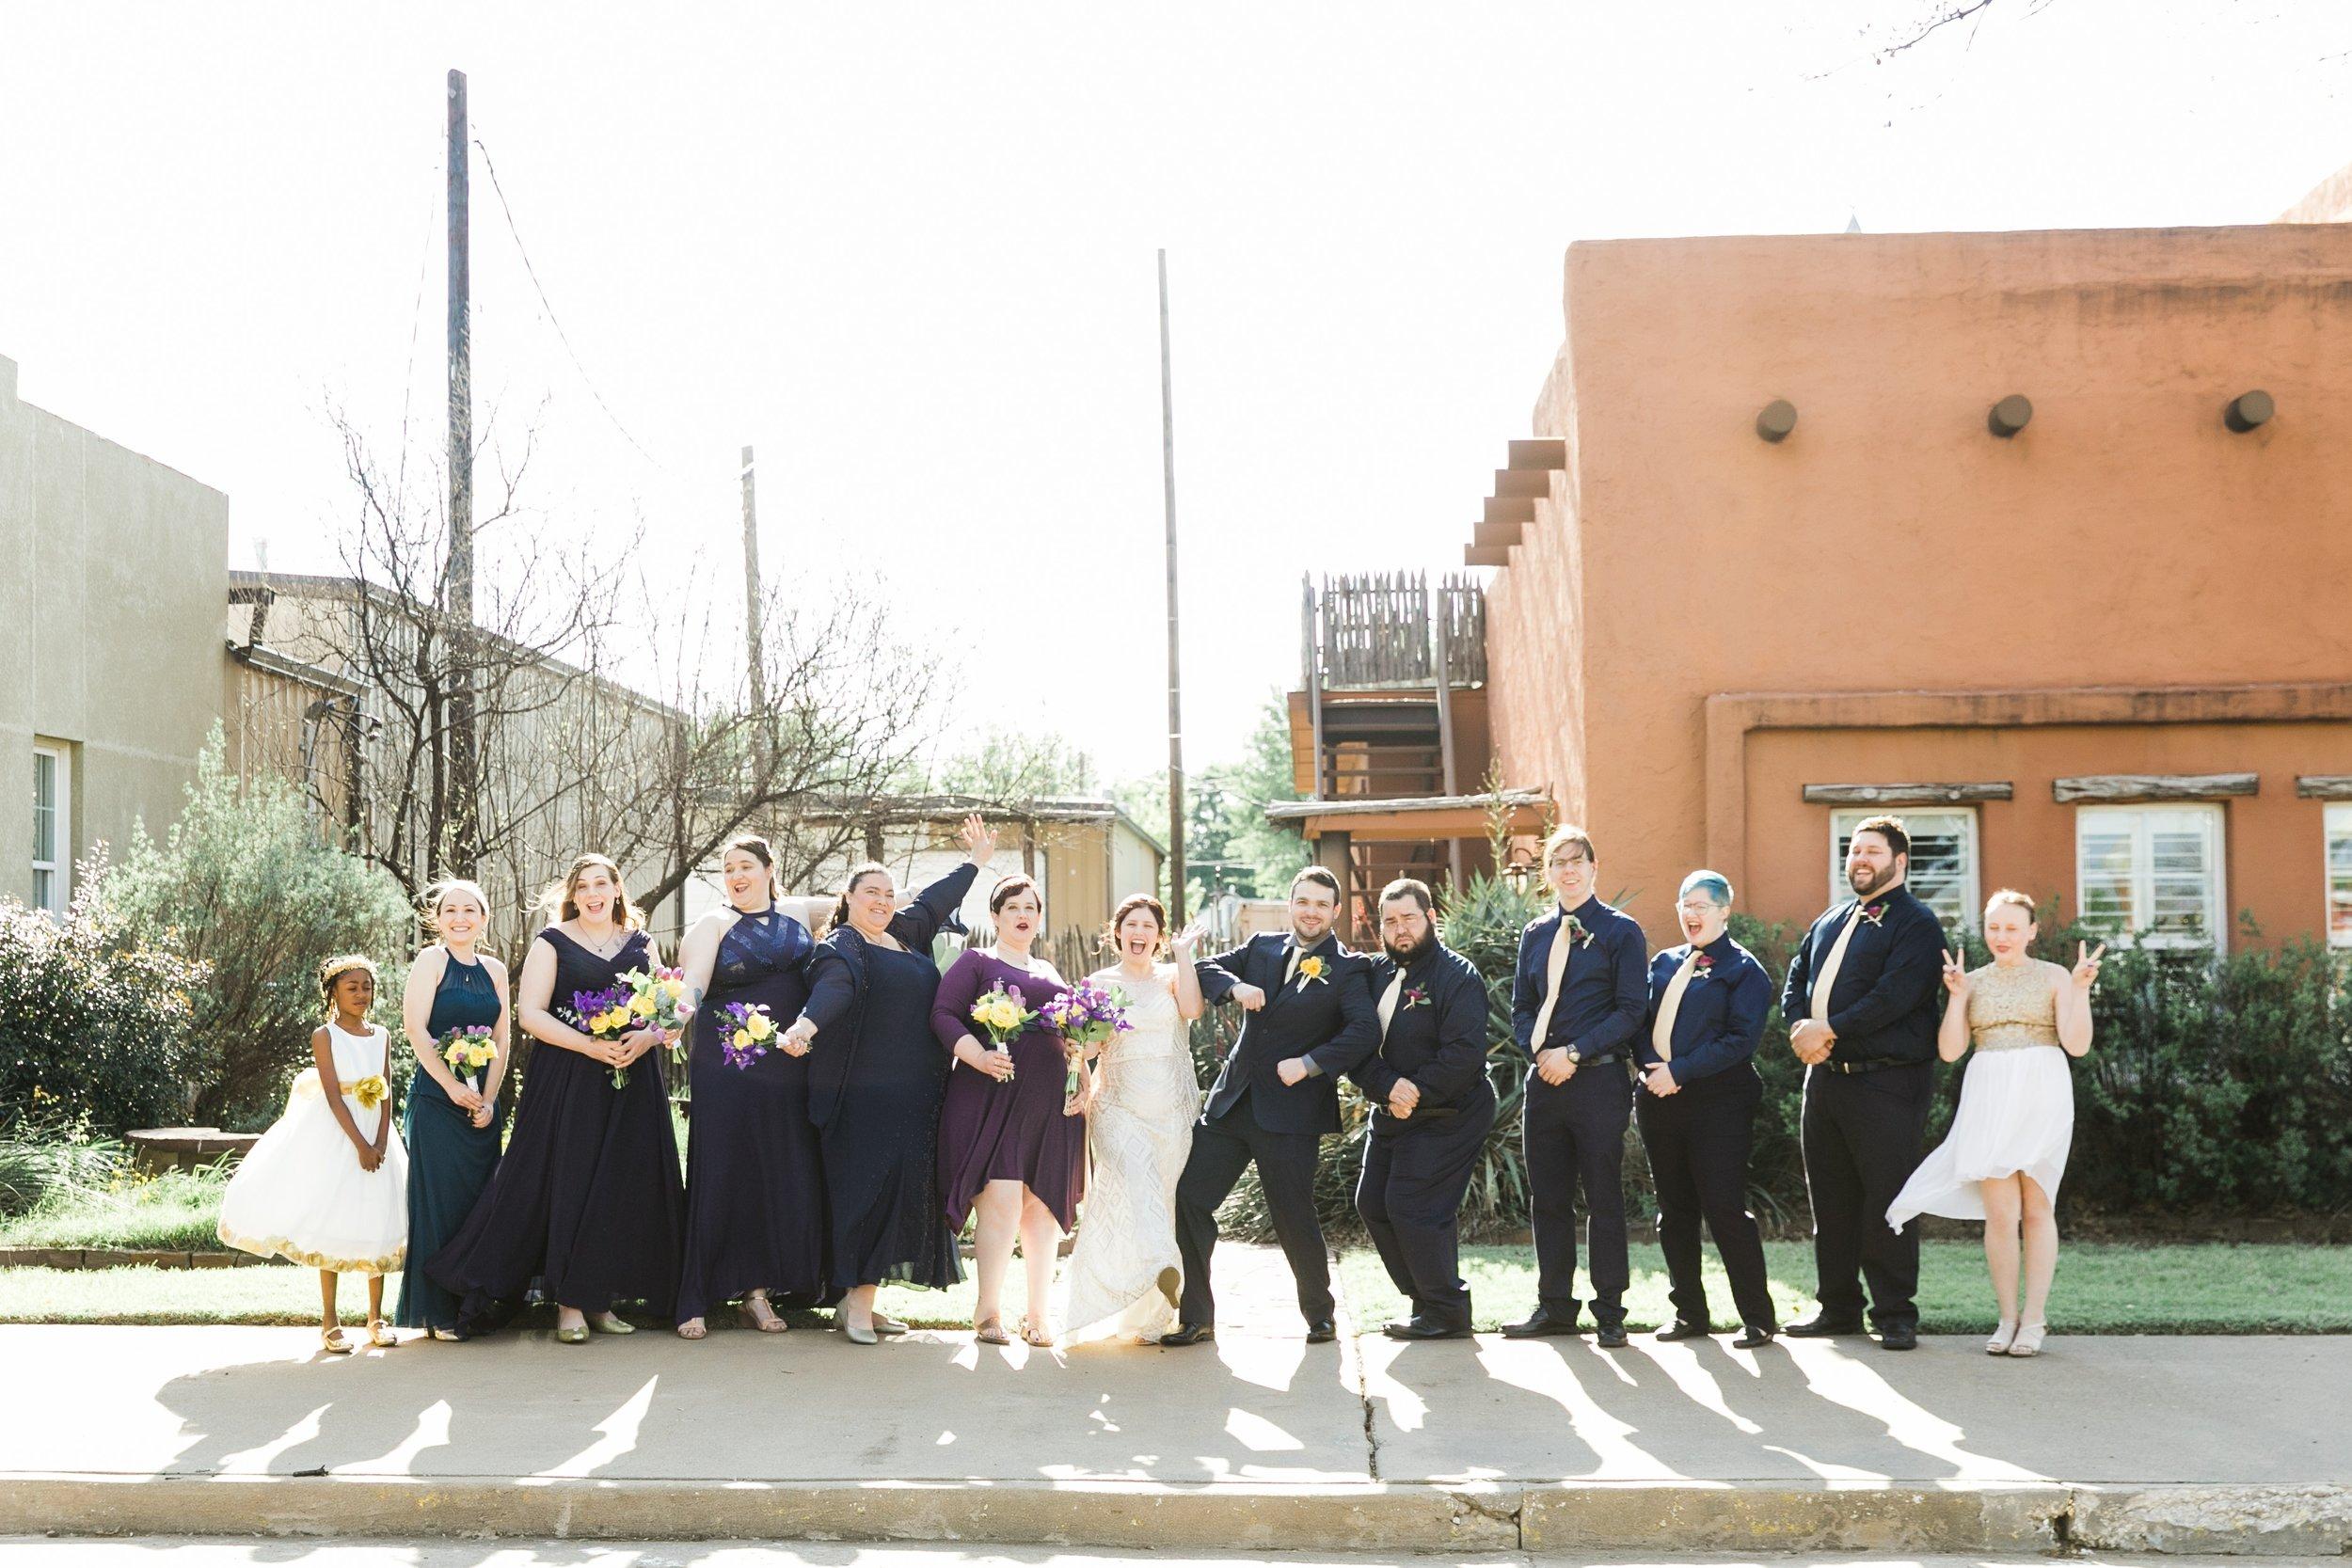 the-rock-barn-henrietta-wedding-photographer-texas-wichita-falls-earth-day-wedding-016.jpg